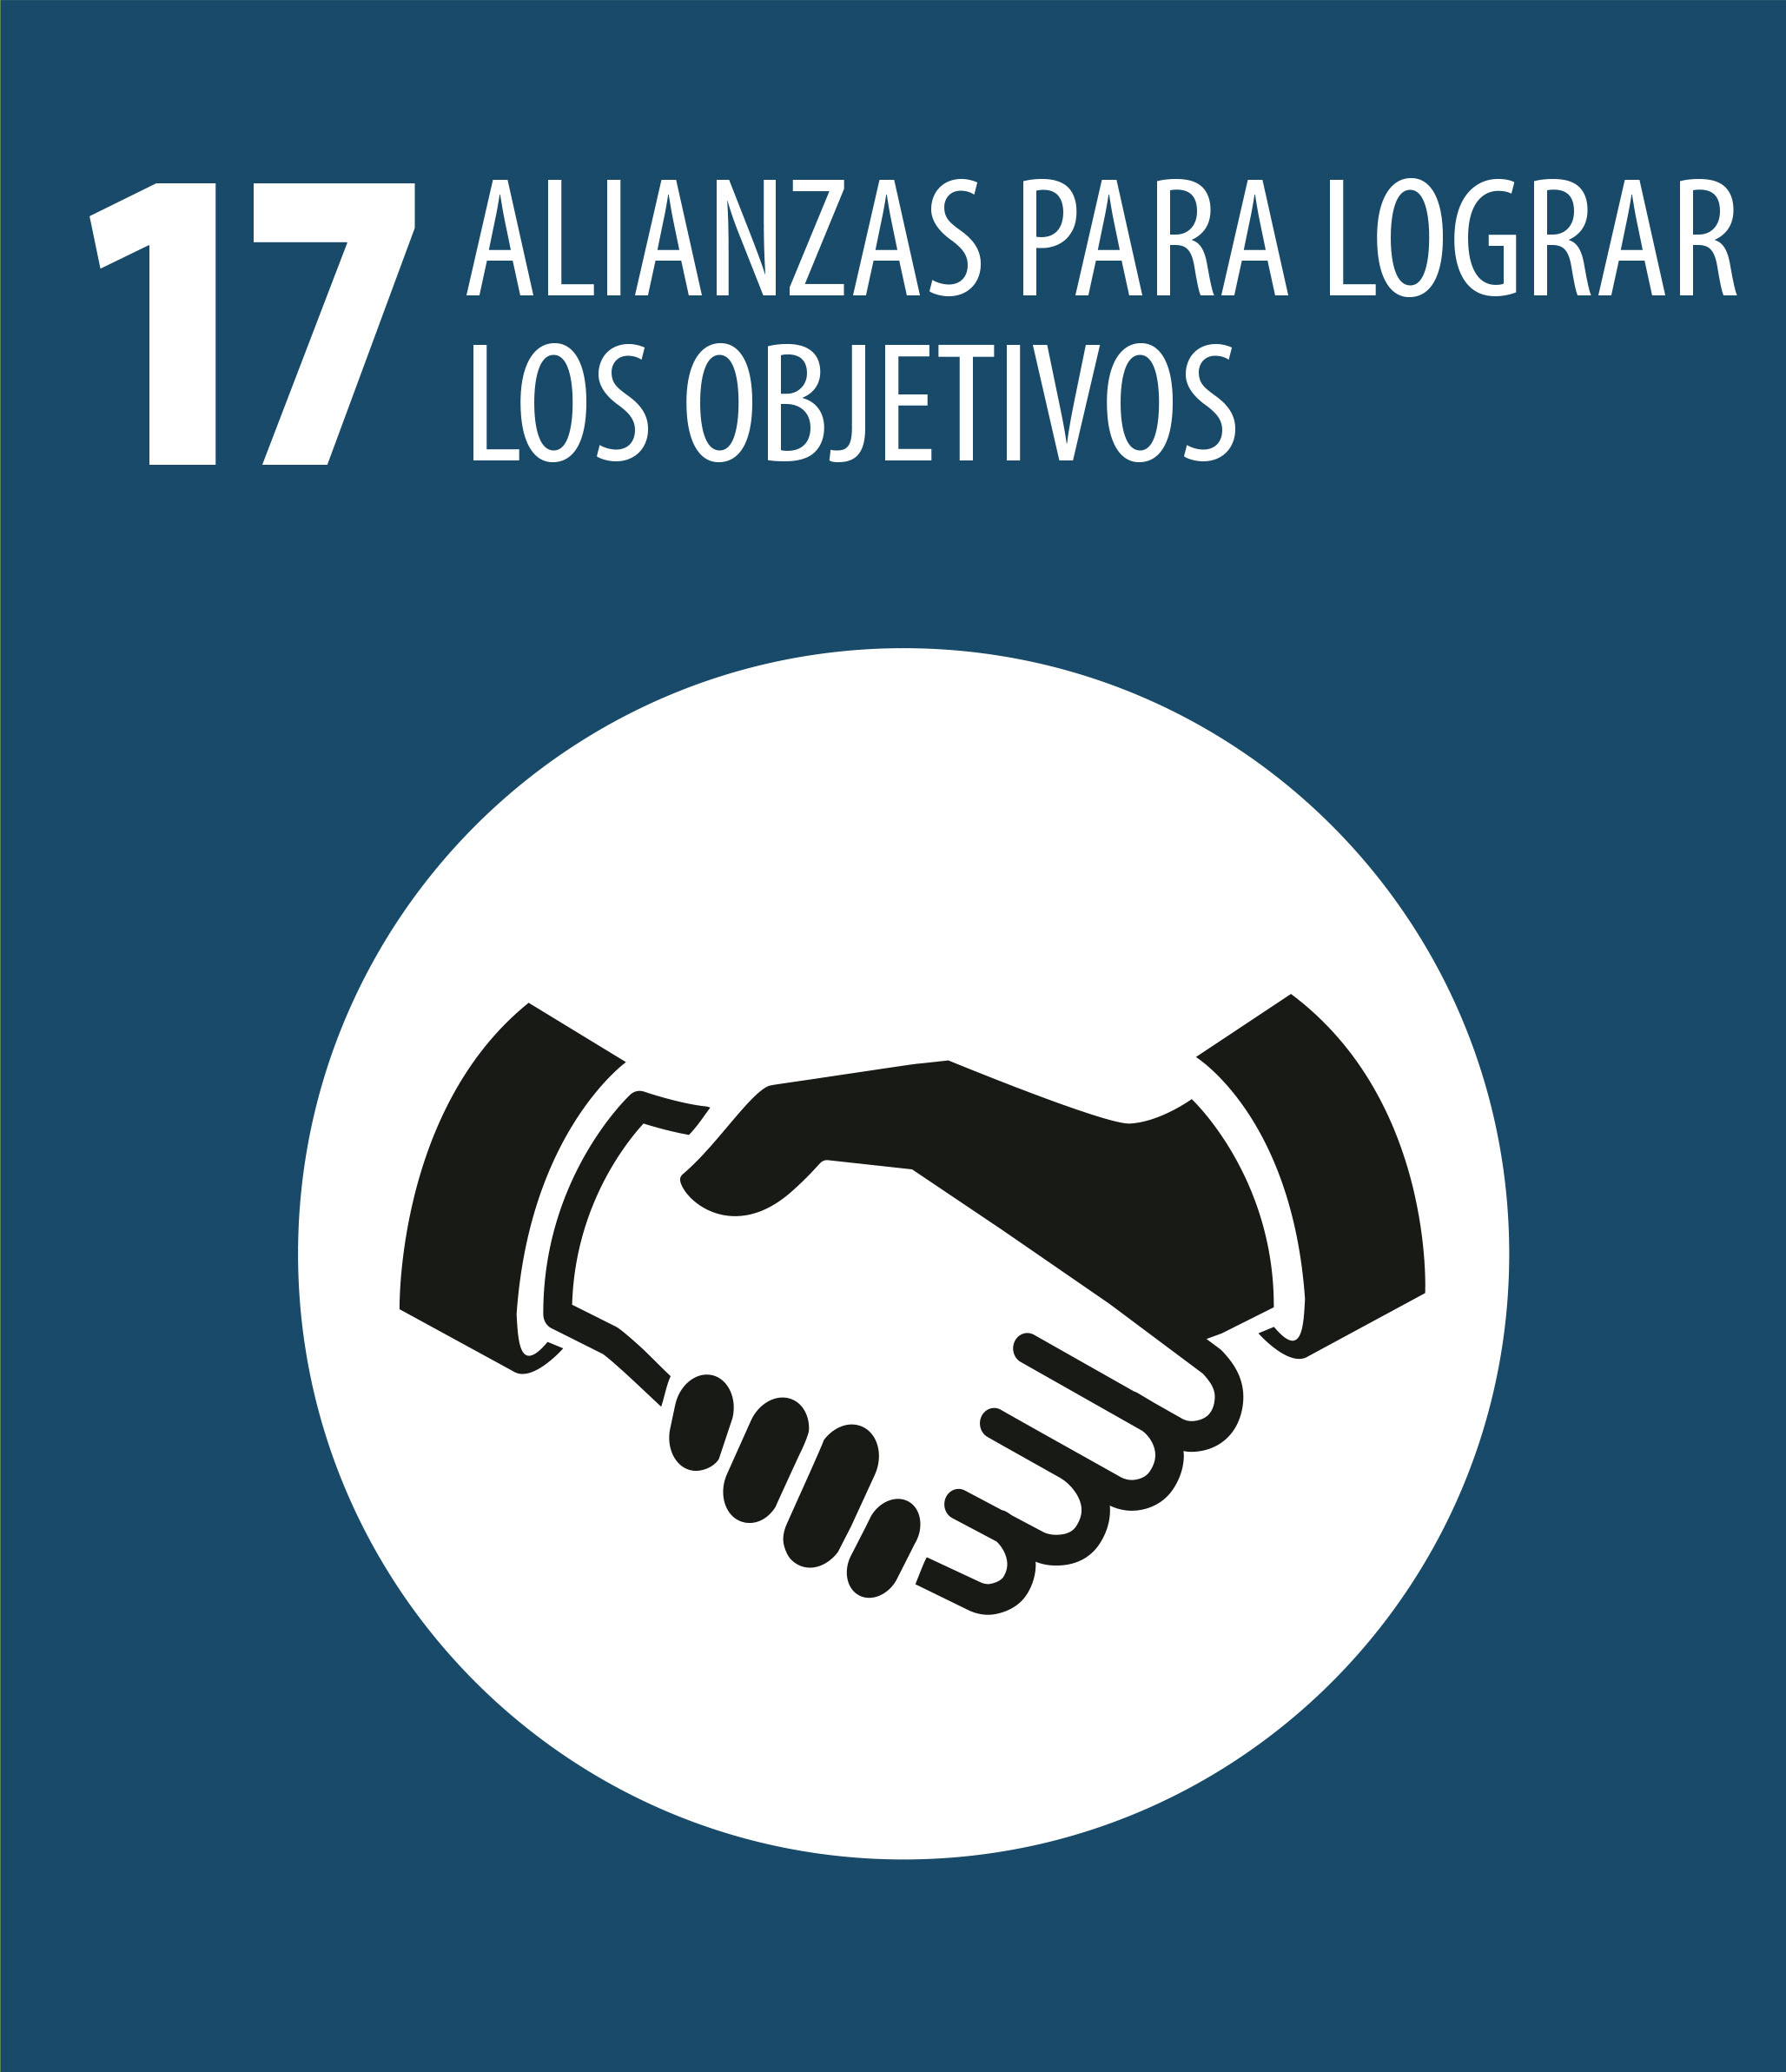 ODS 17 Alianzas para lograr objetivos